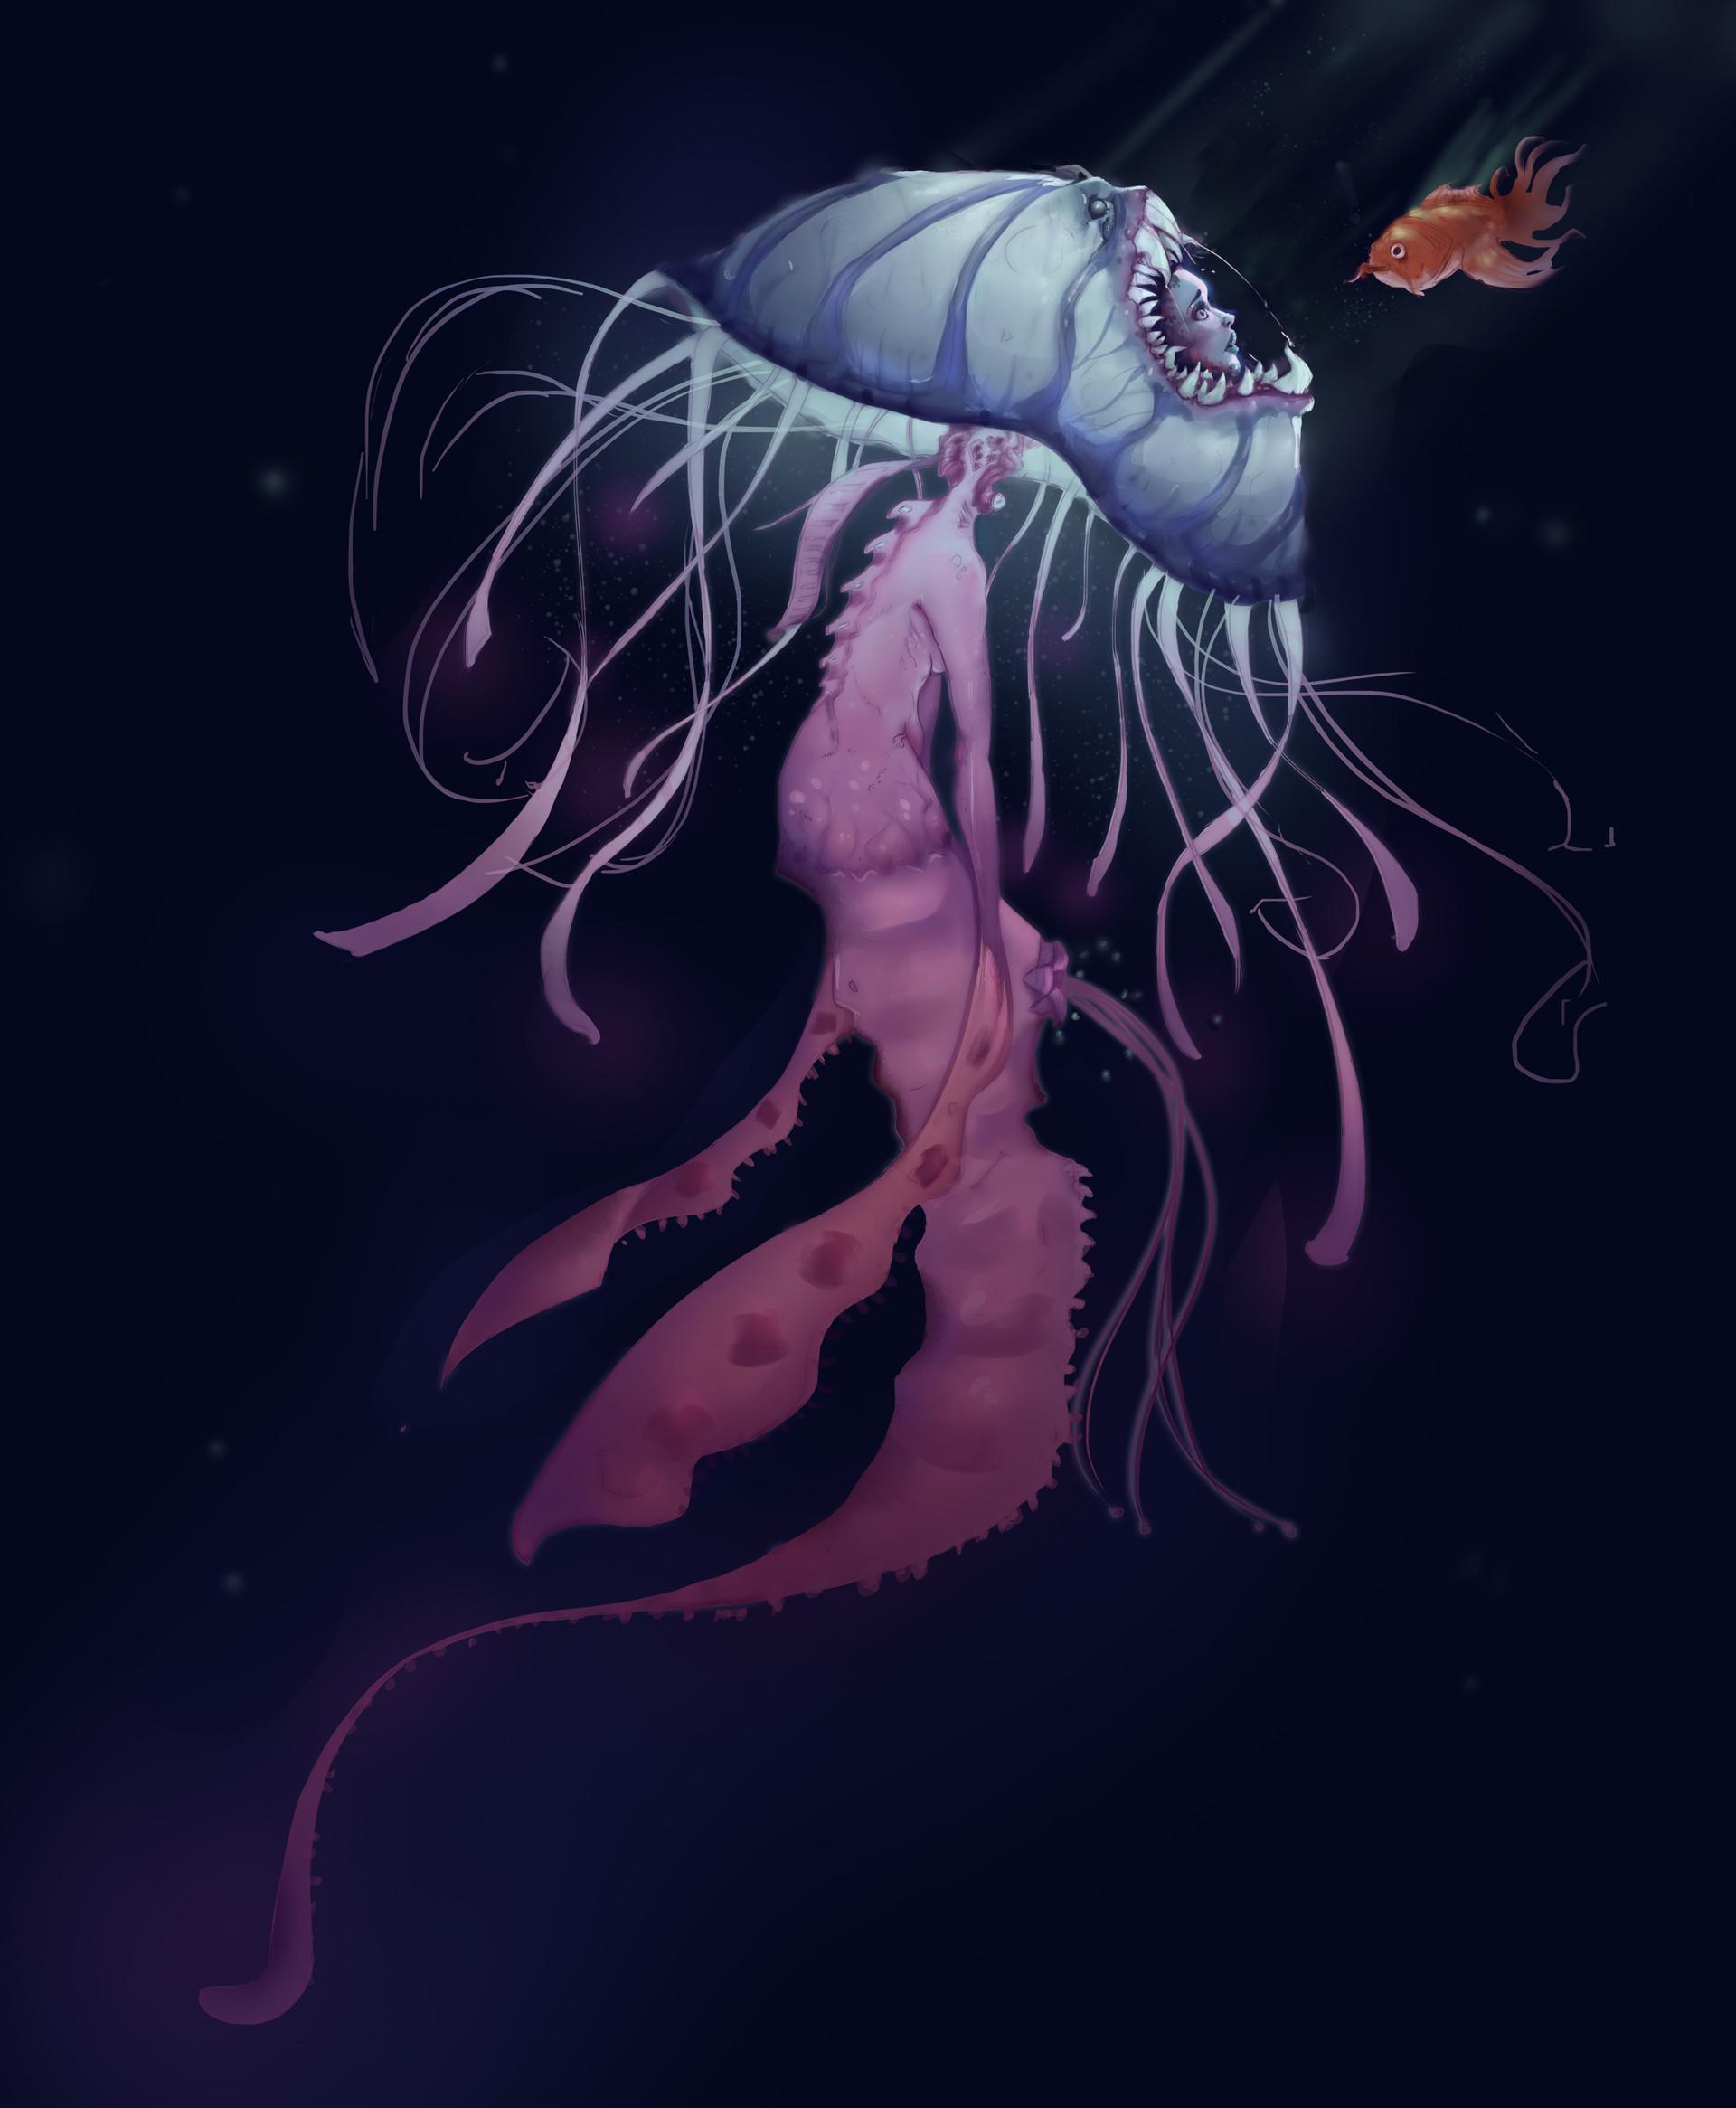 Boyan kazalov jellyfishmonsterplantfinal